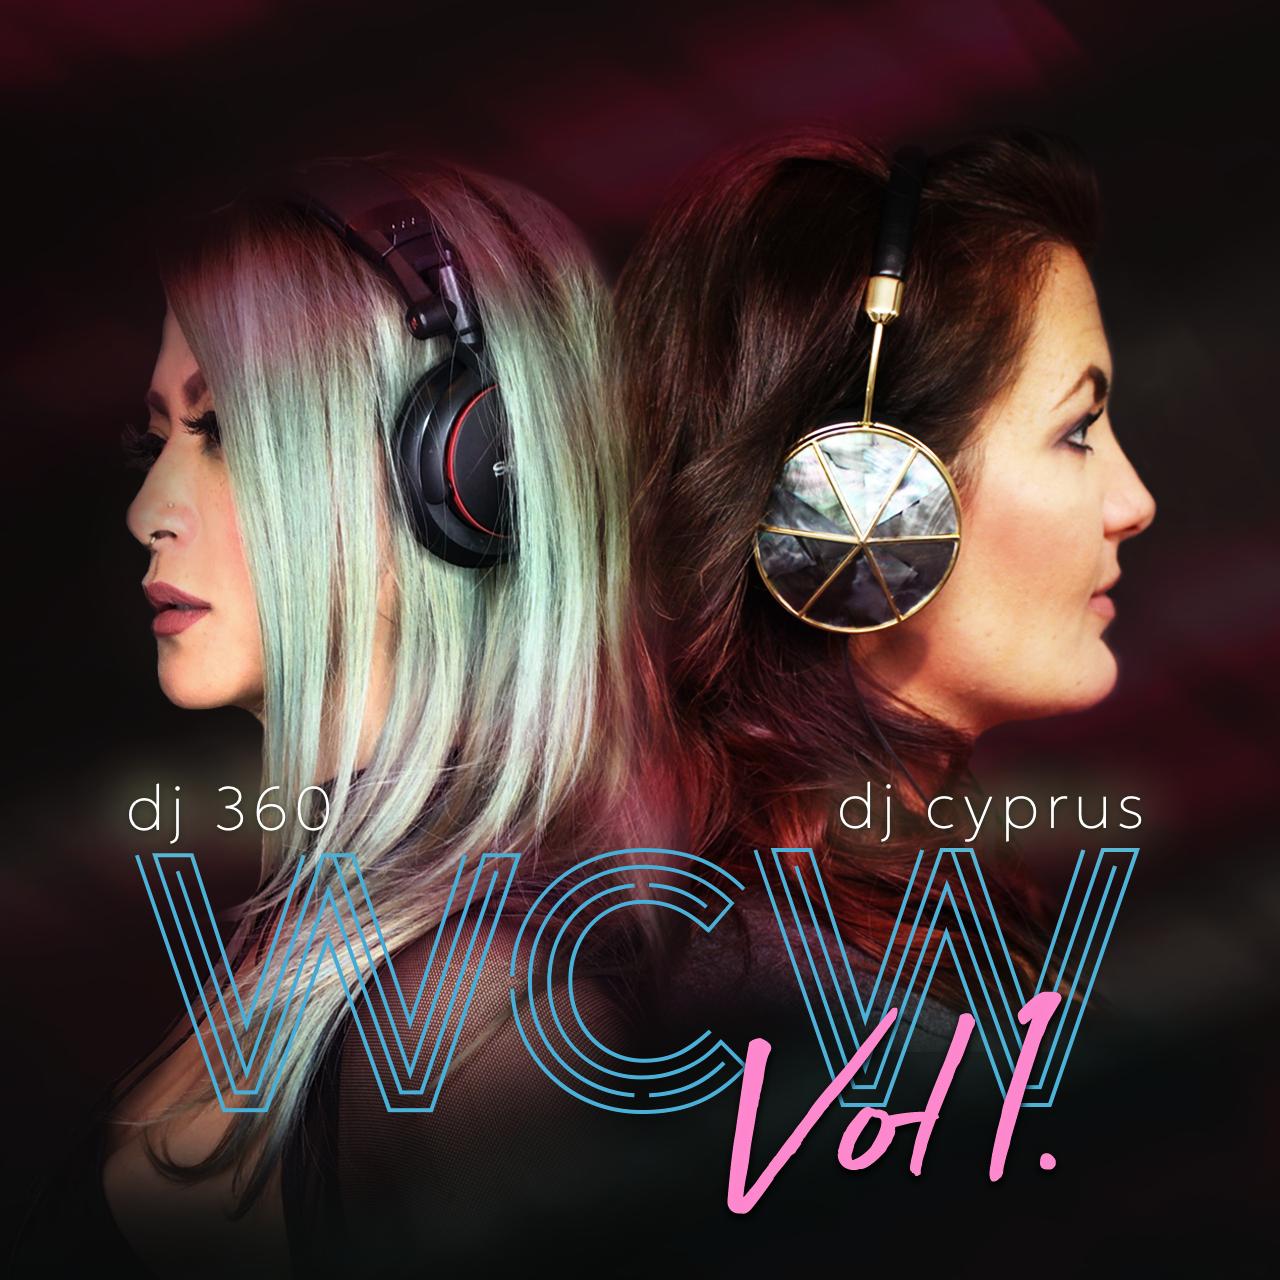 #WCW Vol. 1 [ DJ 360 & DJ Cyprus ]